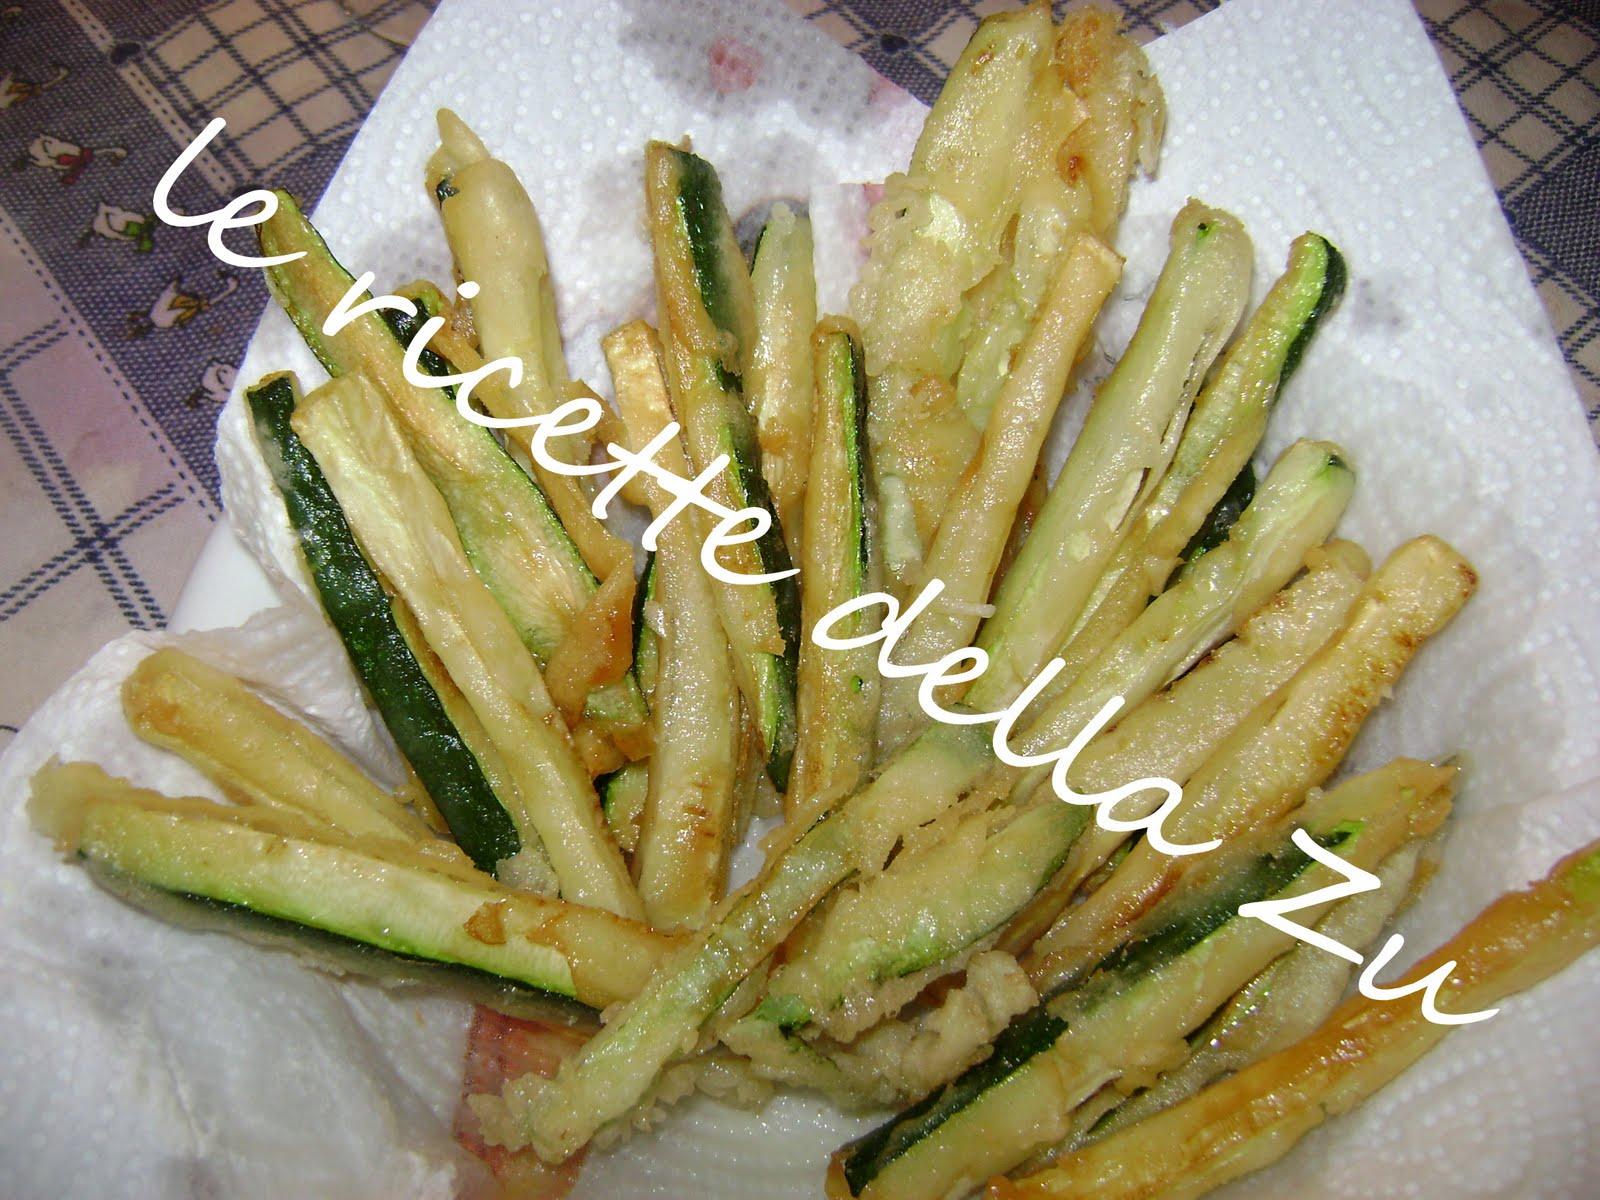 Le ricette della zu fiammiferi di zucchine fritte for Cucinare zucchine